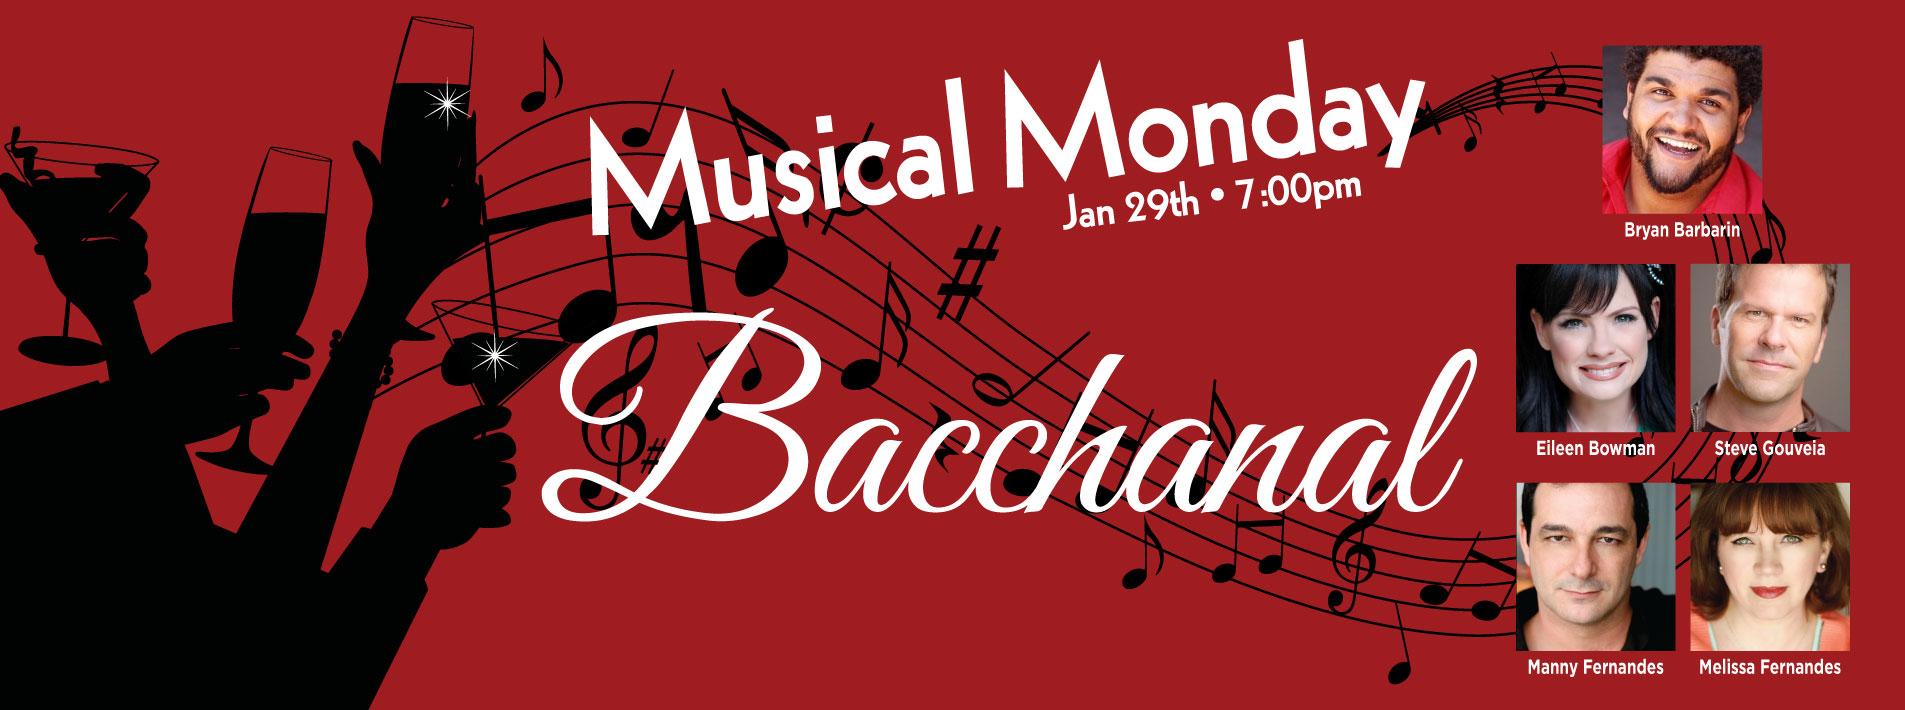 Musical Monday: Bacchanal